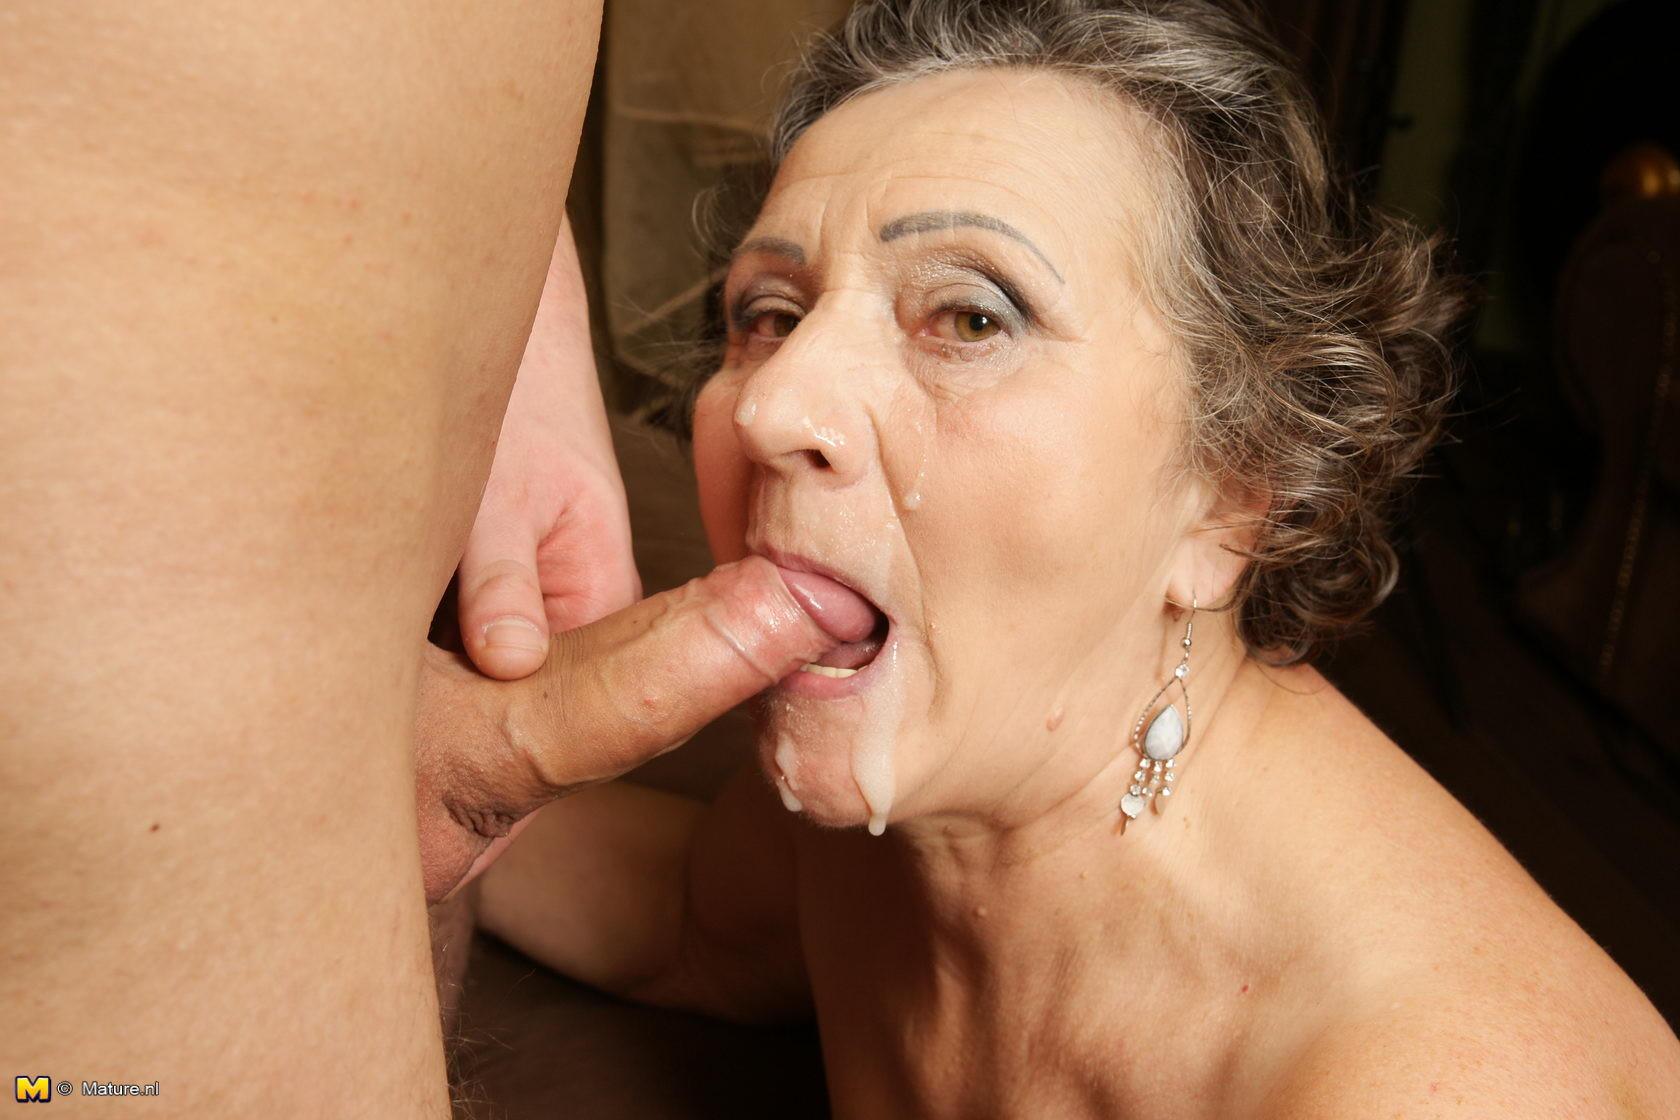 porno-foto-starie-v-rot-porno-lizat-appetitno